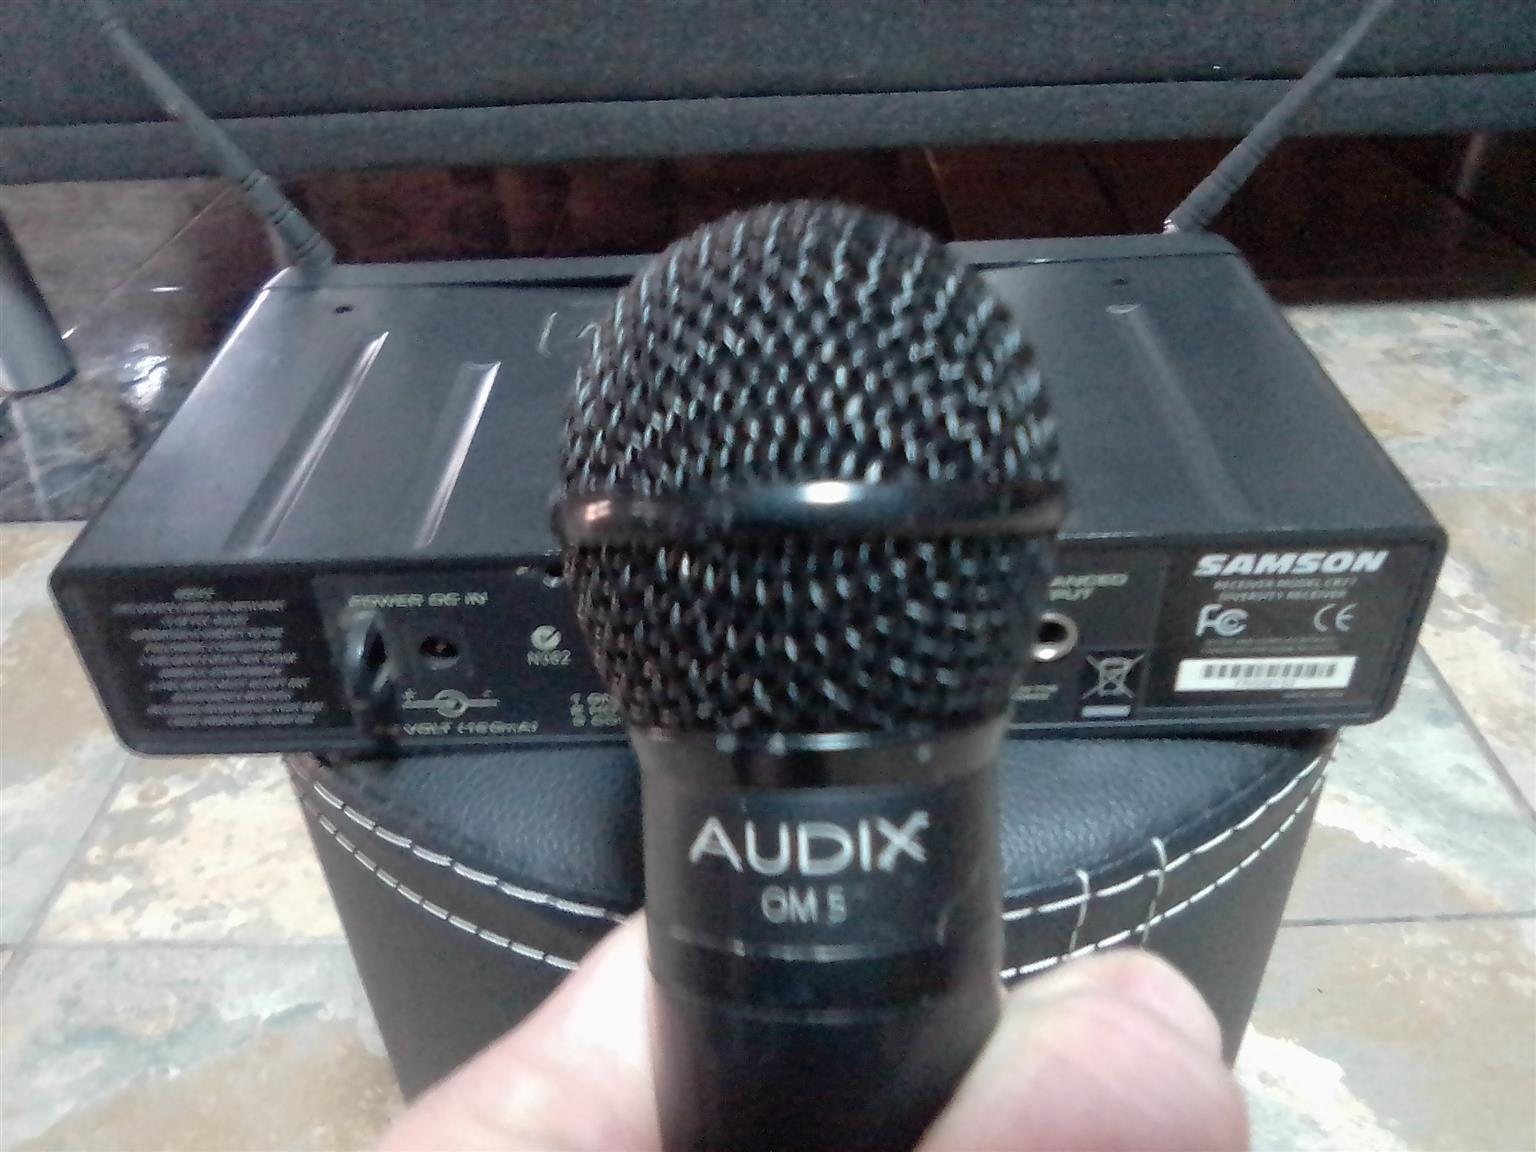 Audix OM5 cordless mic system